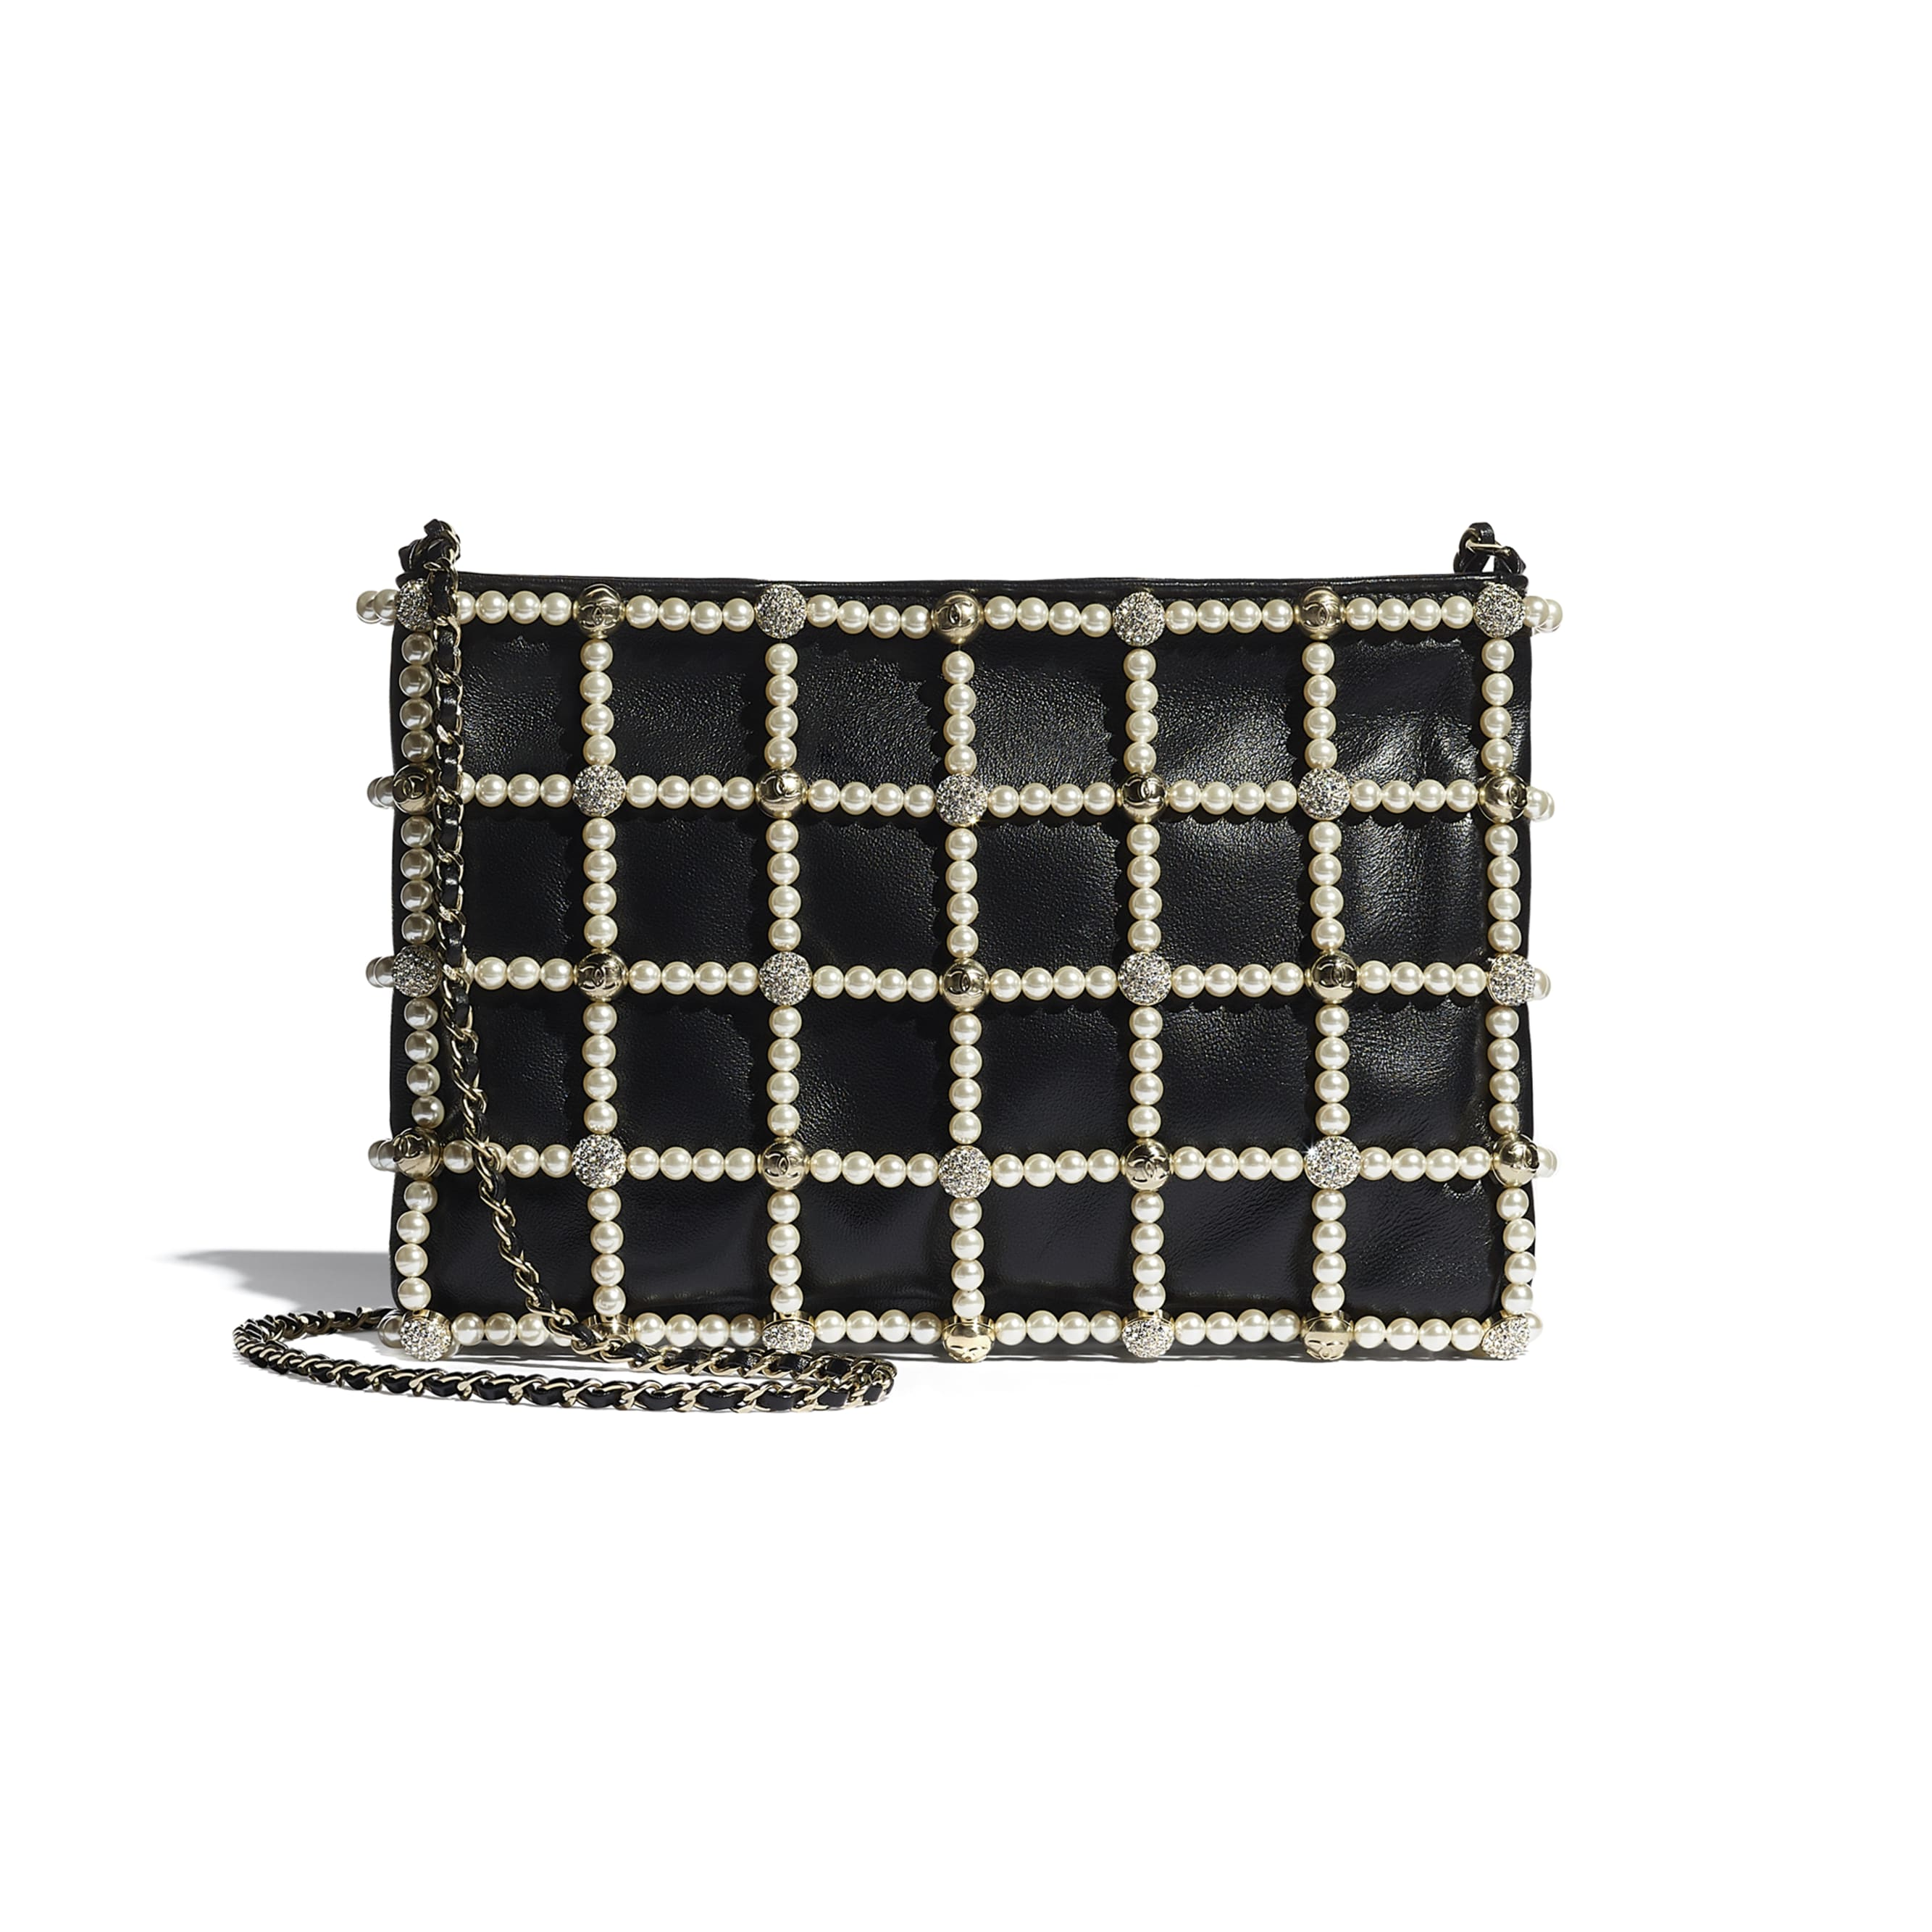 Clutch - Black - Lambskin, Calfskin, Glass Pearls, Strass & Gold-Tone Metal - CHANEL - Vista alternativa - ver a versão em tamanho standard